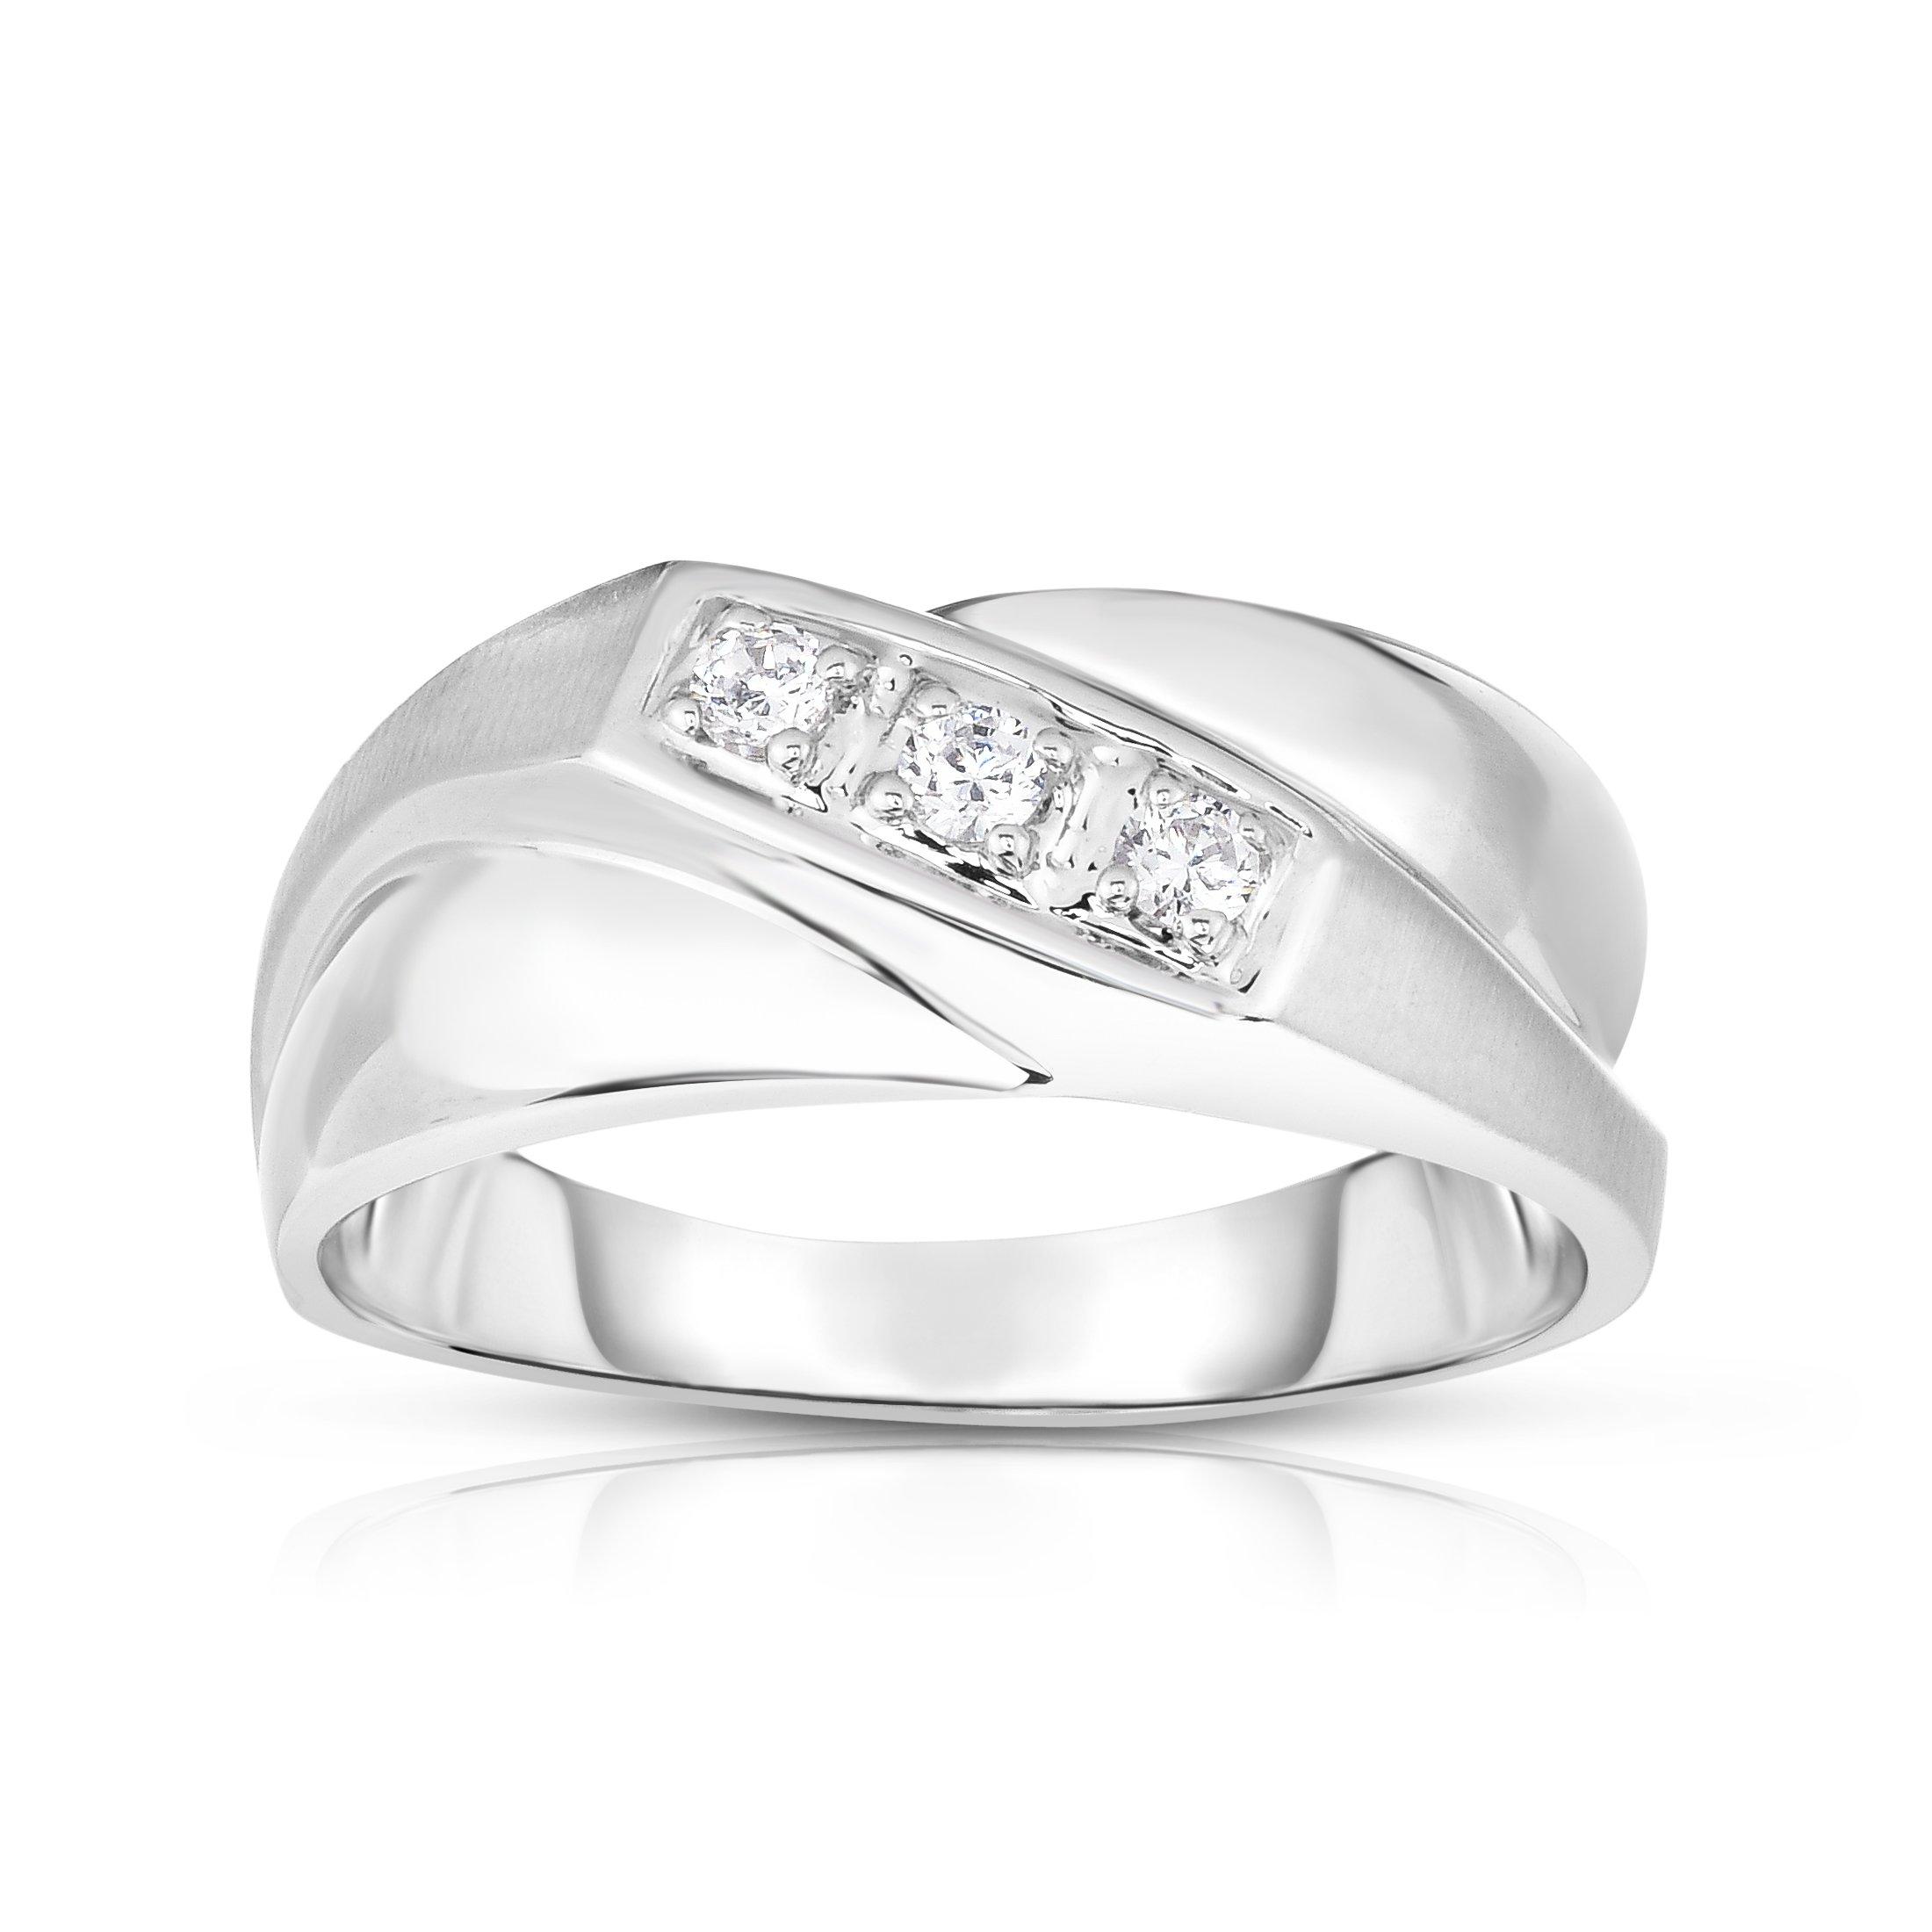 Noray Designs 14K White Gold Diamond (0.15 Ct, I1-I2 Clarity, G-H Color) Men's 3-Stone Ring